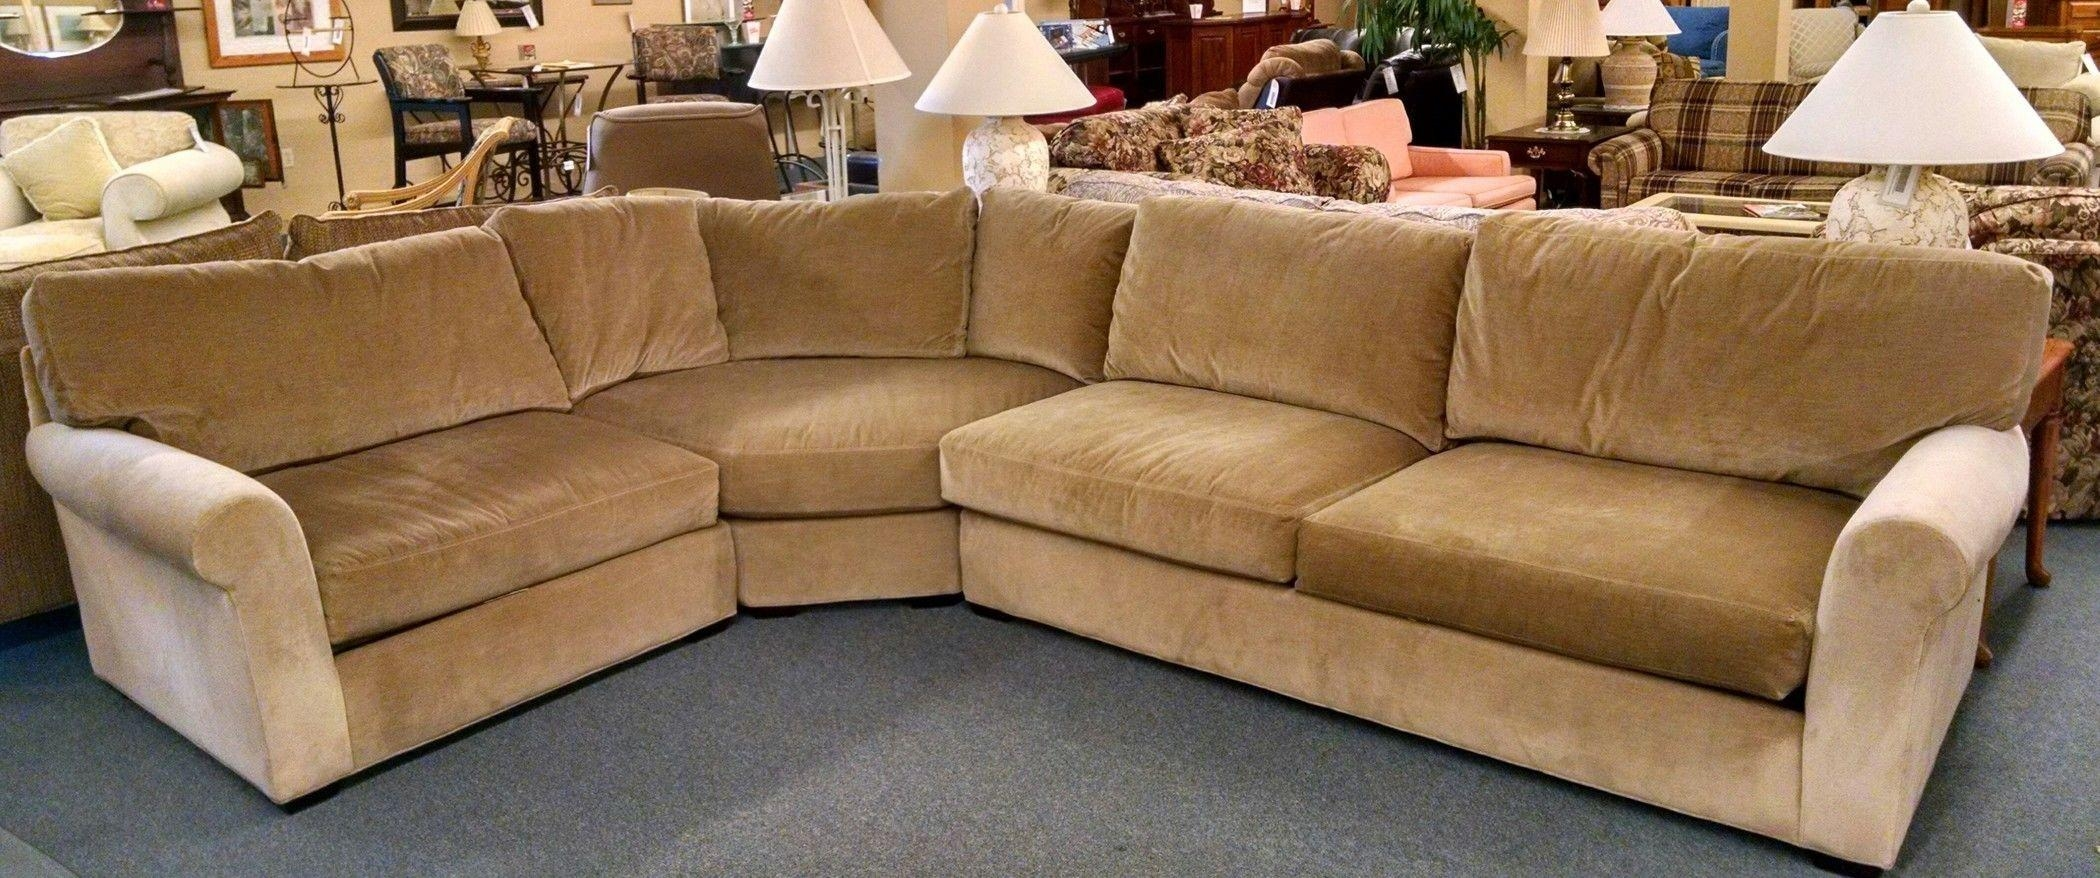 Mitchell gold sofa prices select modern mitchell gold bob williams sofa sofas beds mitchell Sectional sofa prices